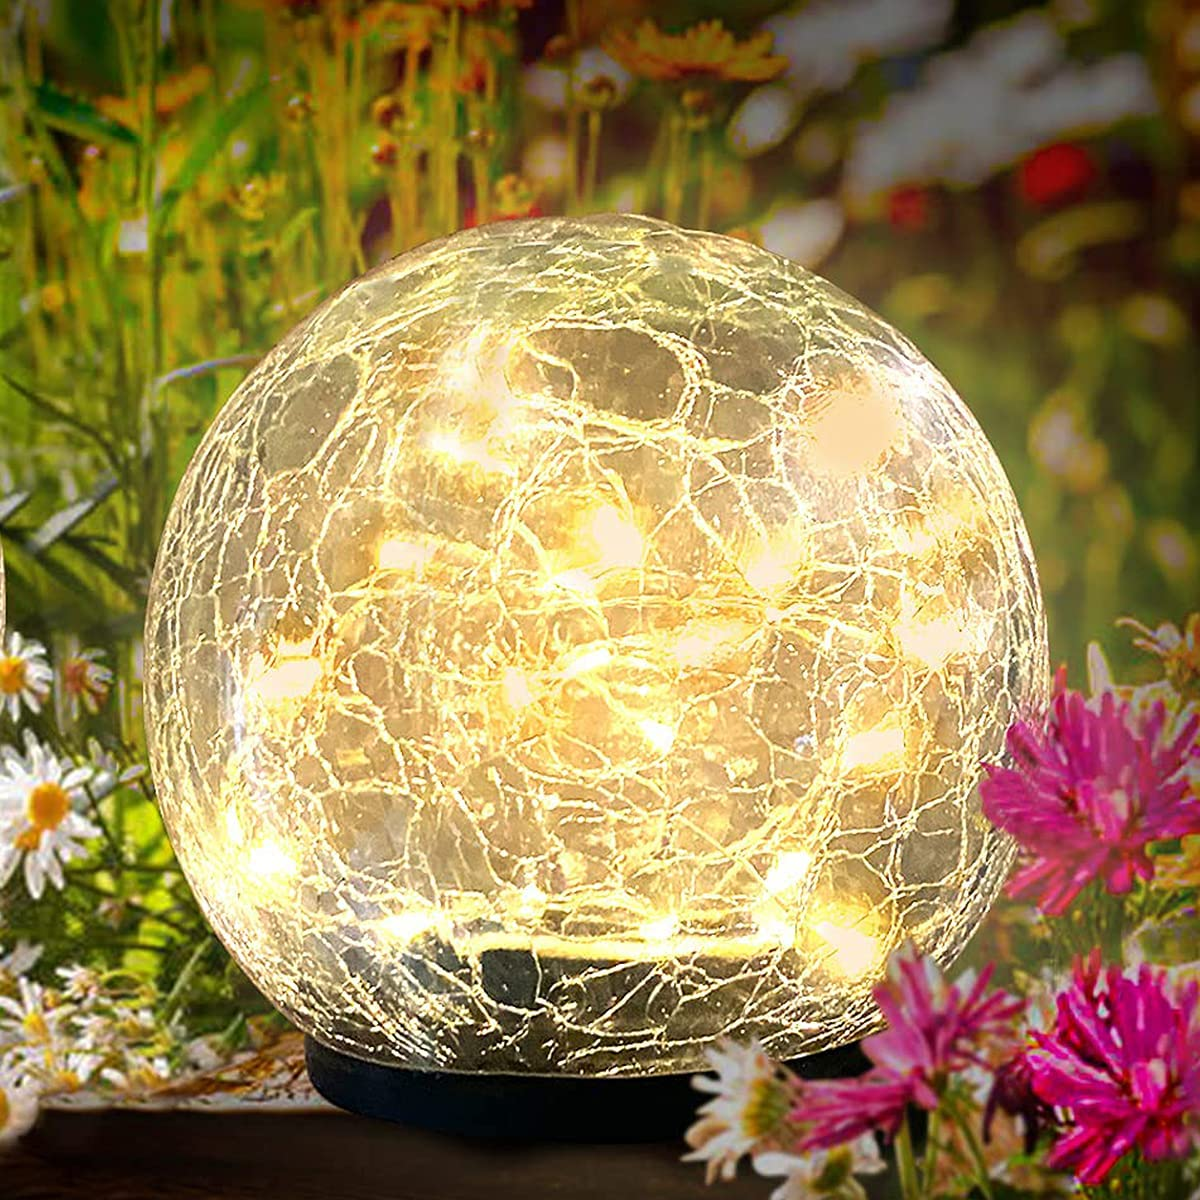 OHINGLT Solar Garden Lights Outdoor Cracked Glass Ball Waterproof Wireless Warm White LED Lamp for Garden Decor Pool Yard Art Pathway Patio Walkway Lawn Ornaments 1 Globe(3.94